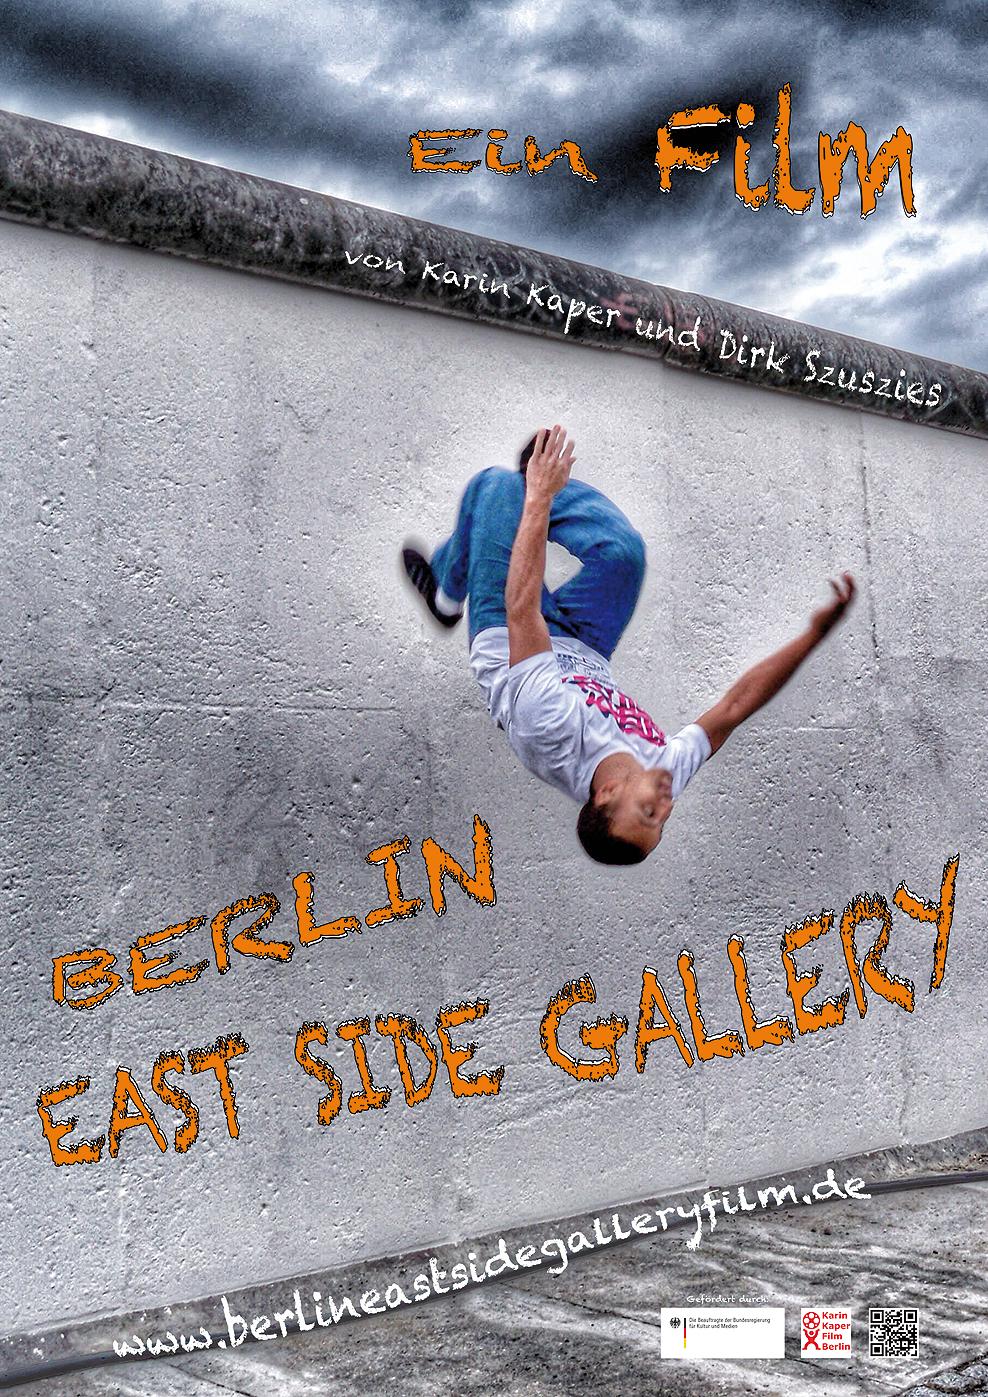 Berlin East Side Gallery (Poster)